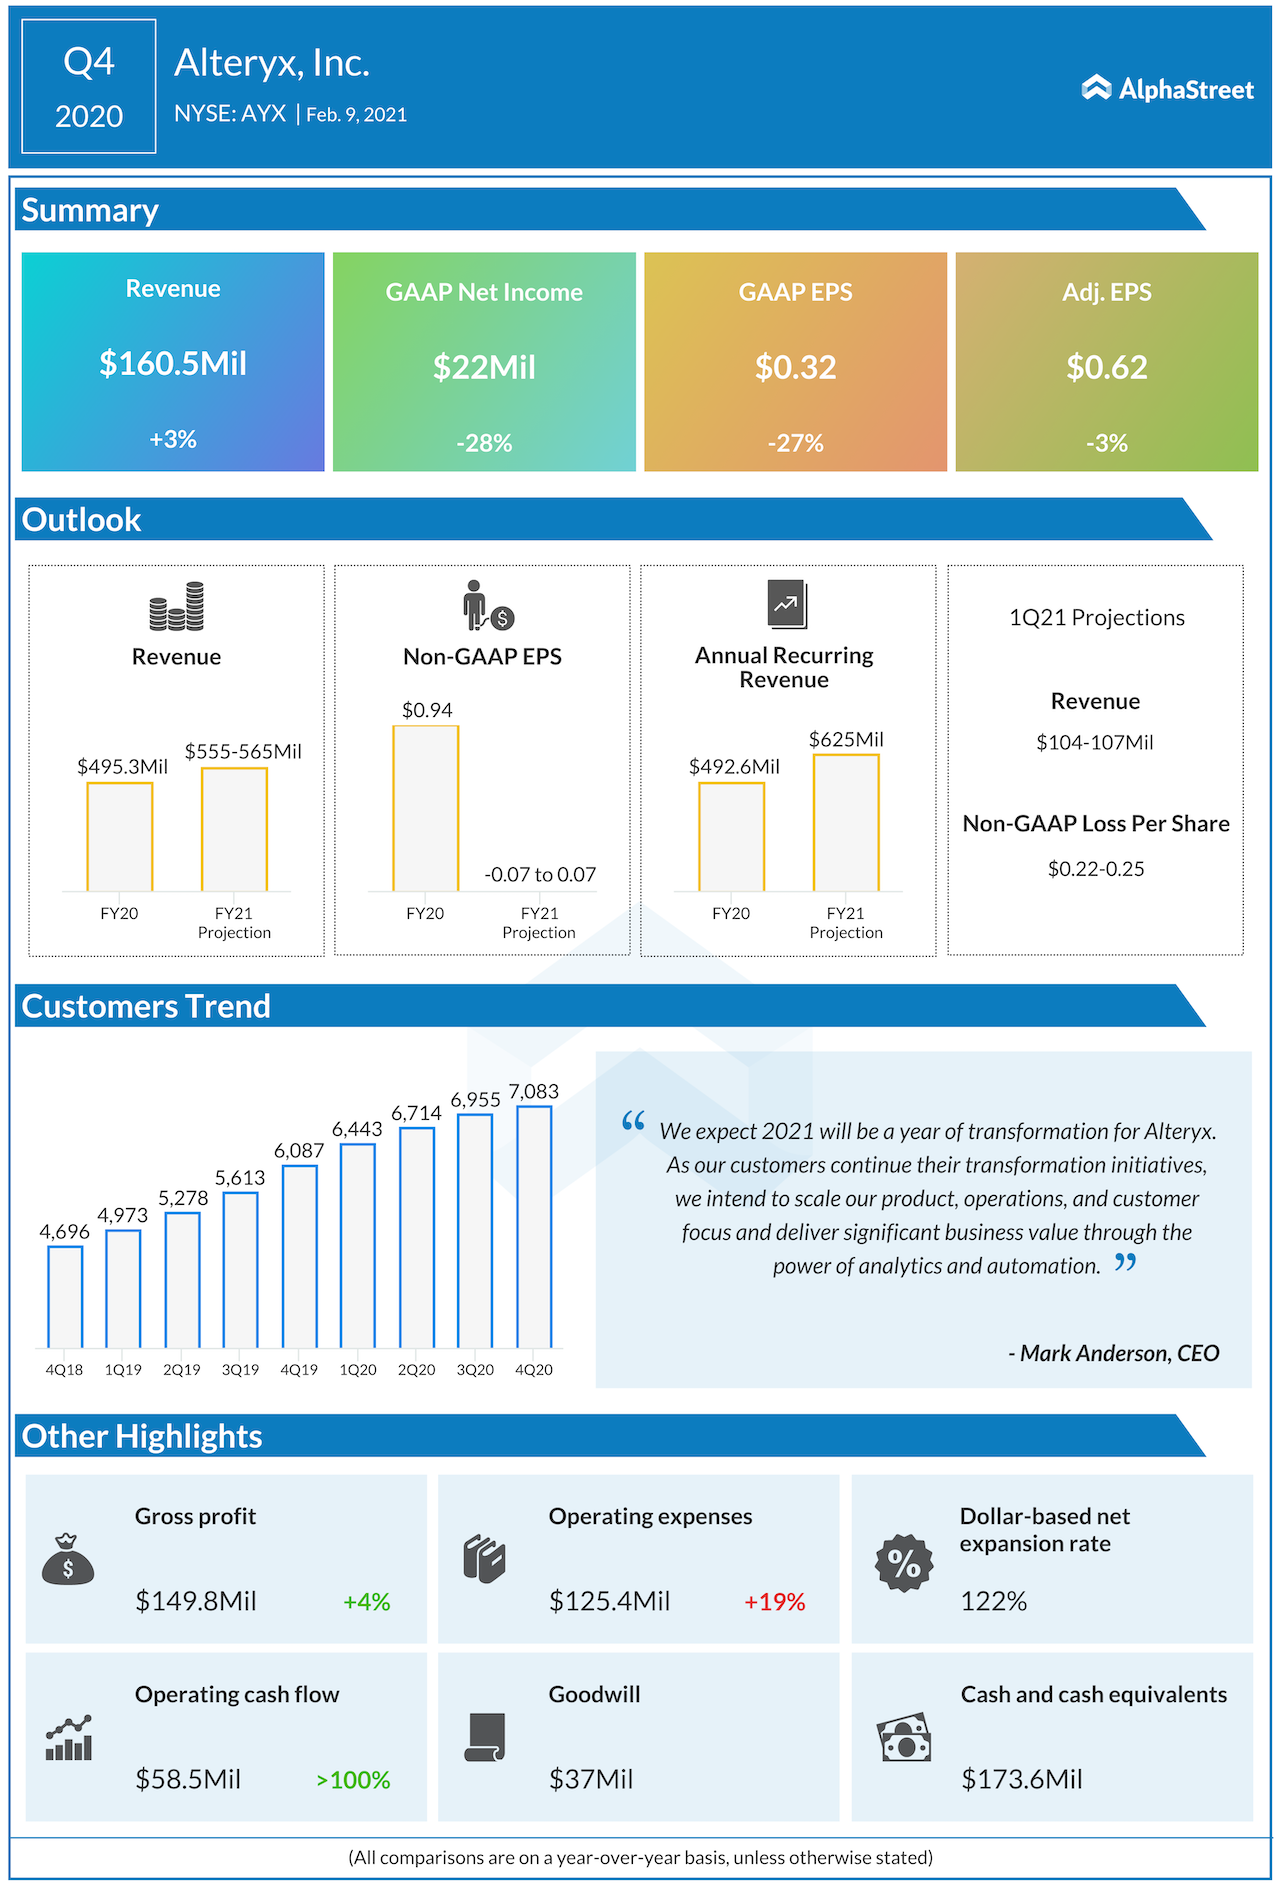 Alteryx Q4 2020 earnings